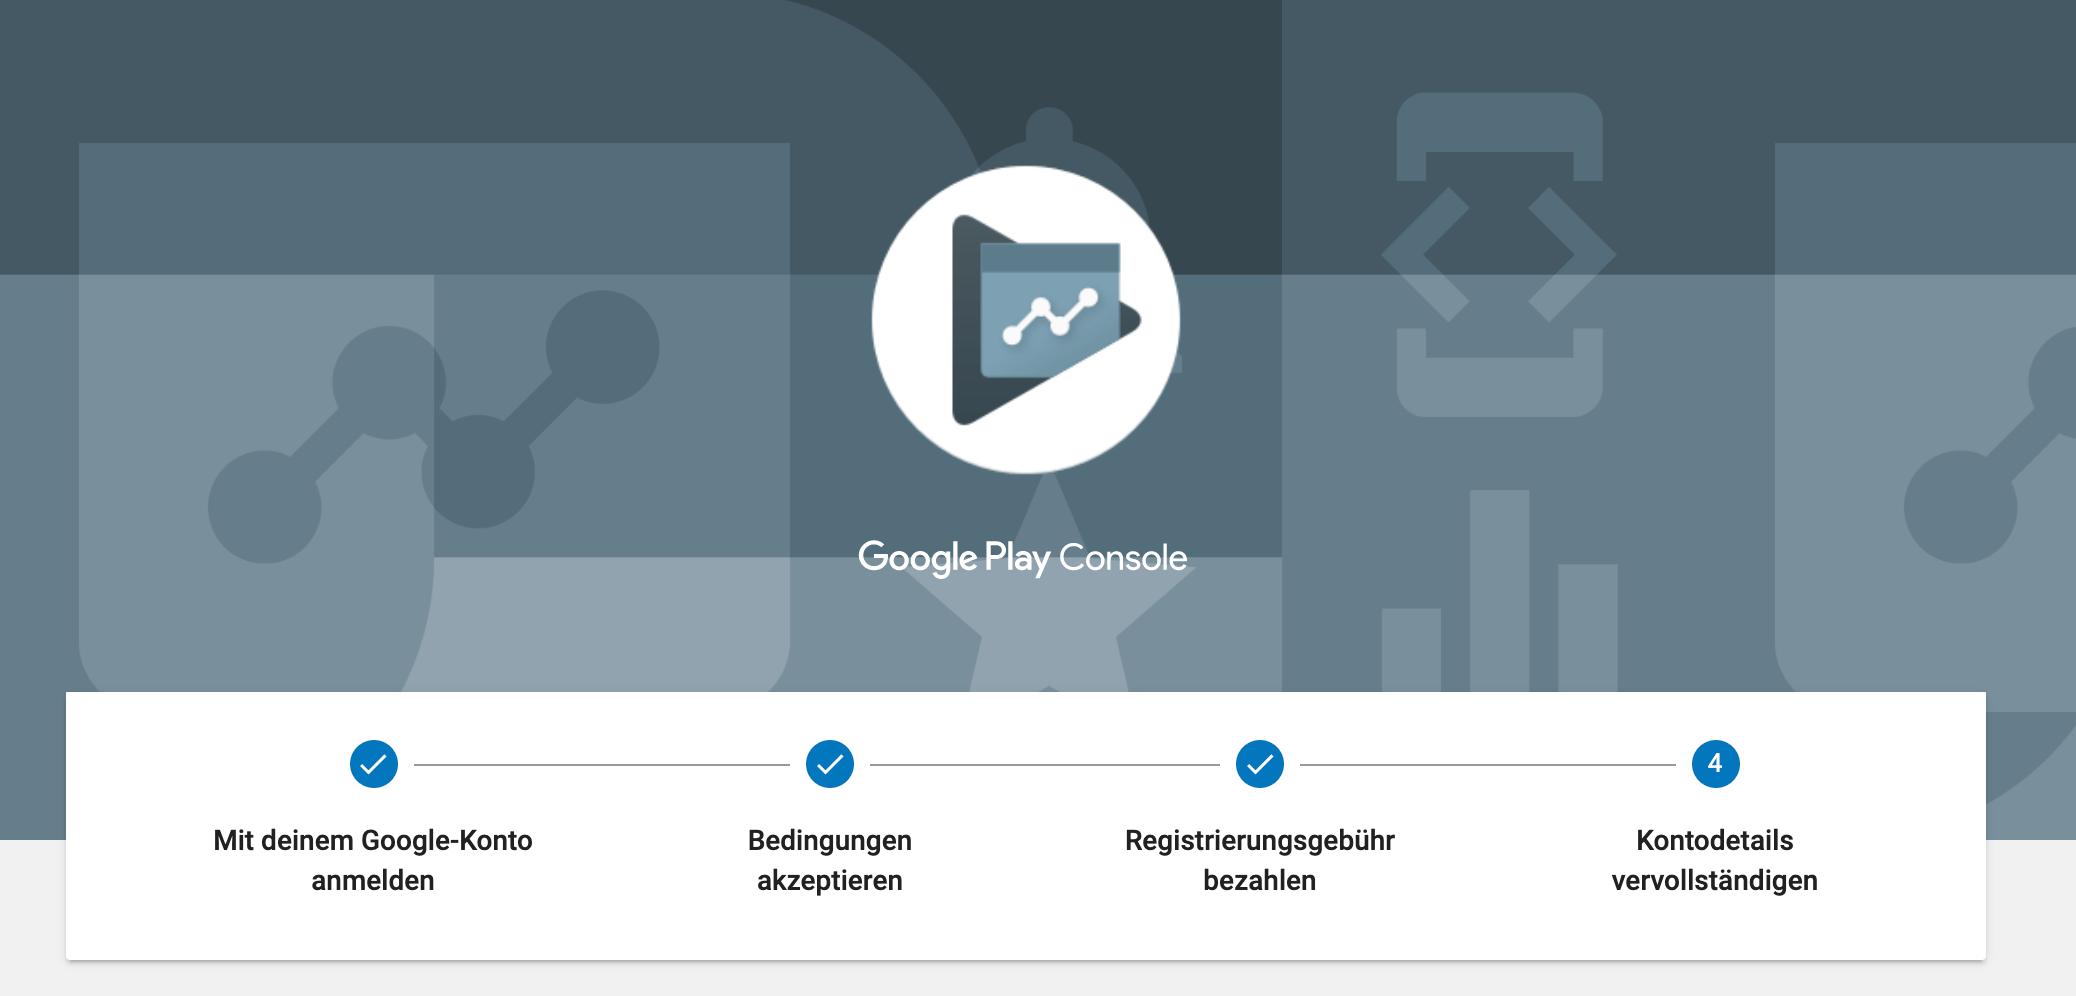 Google Play Console: Registrierung